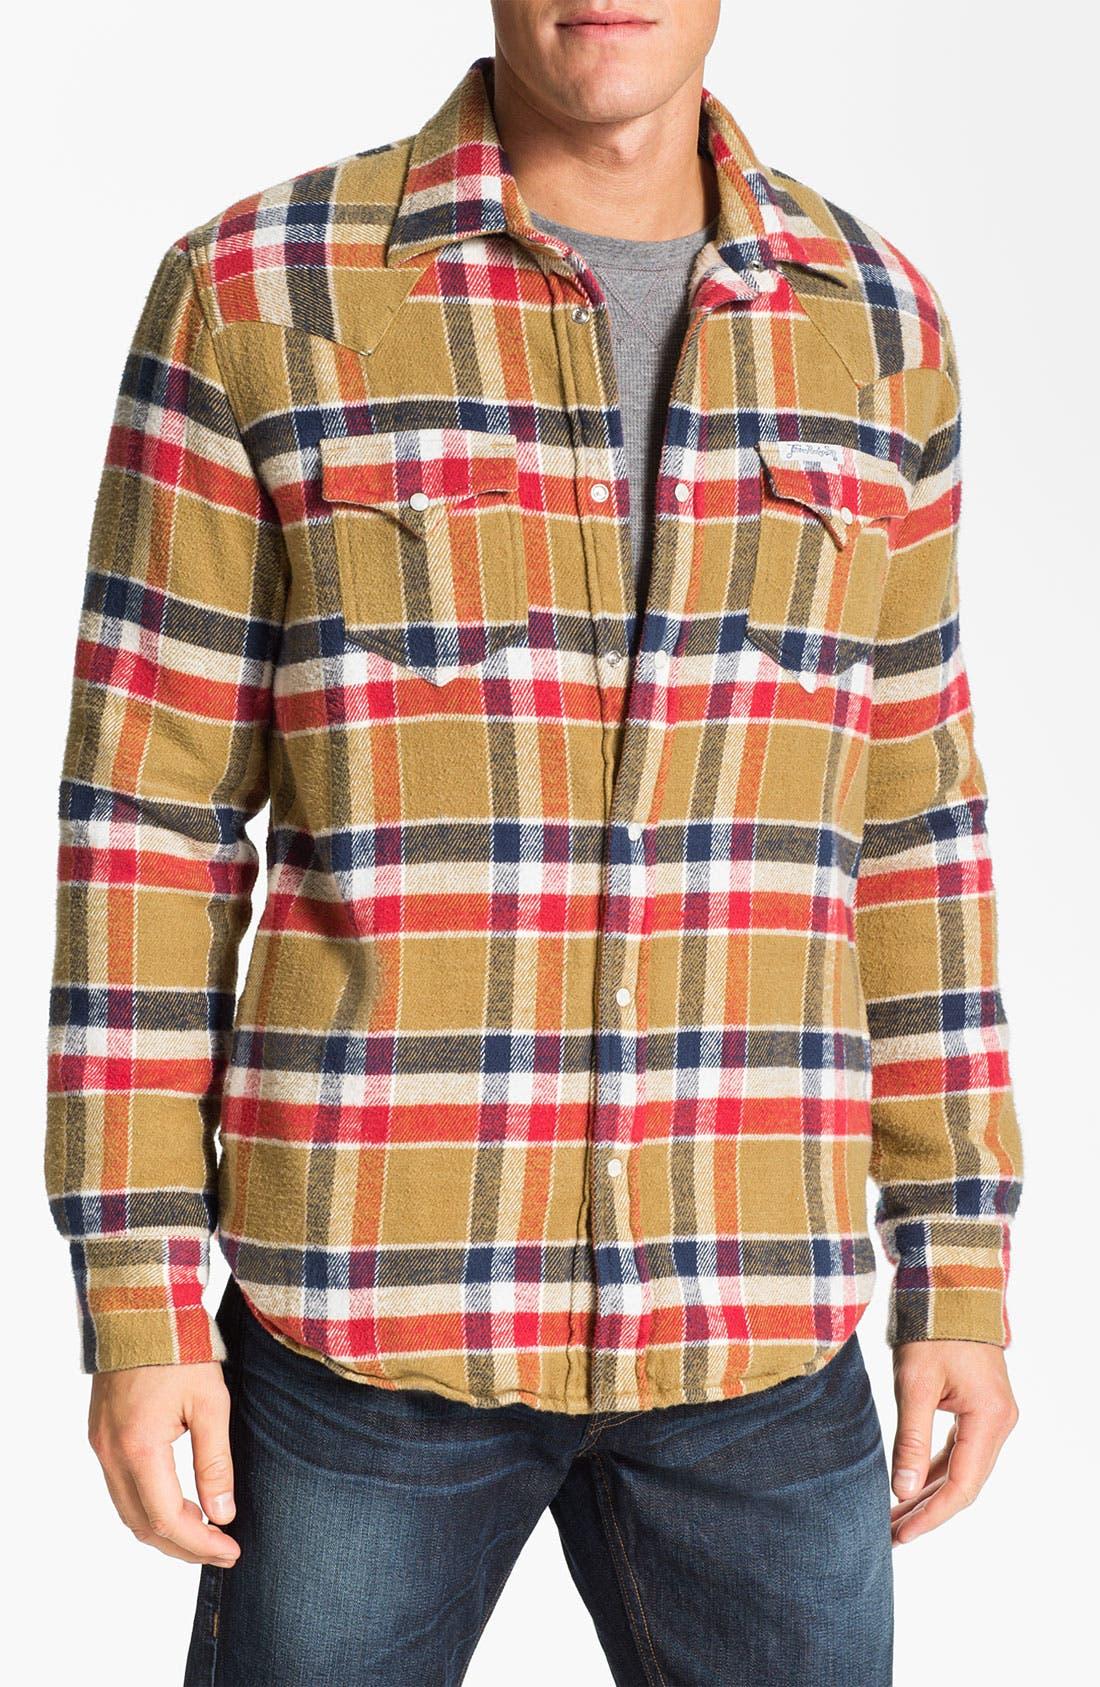 Main Image - True Religion Brand Jeans Plaid Flannel Shirt Jacket